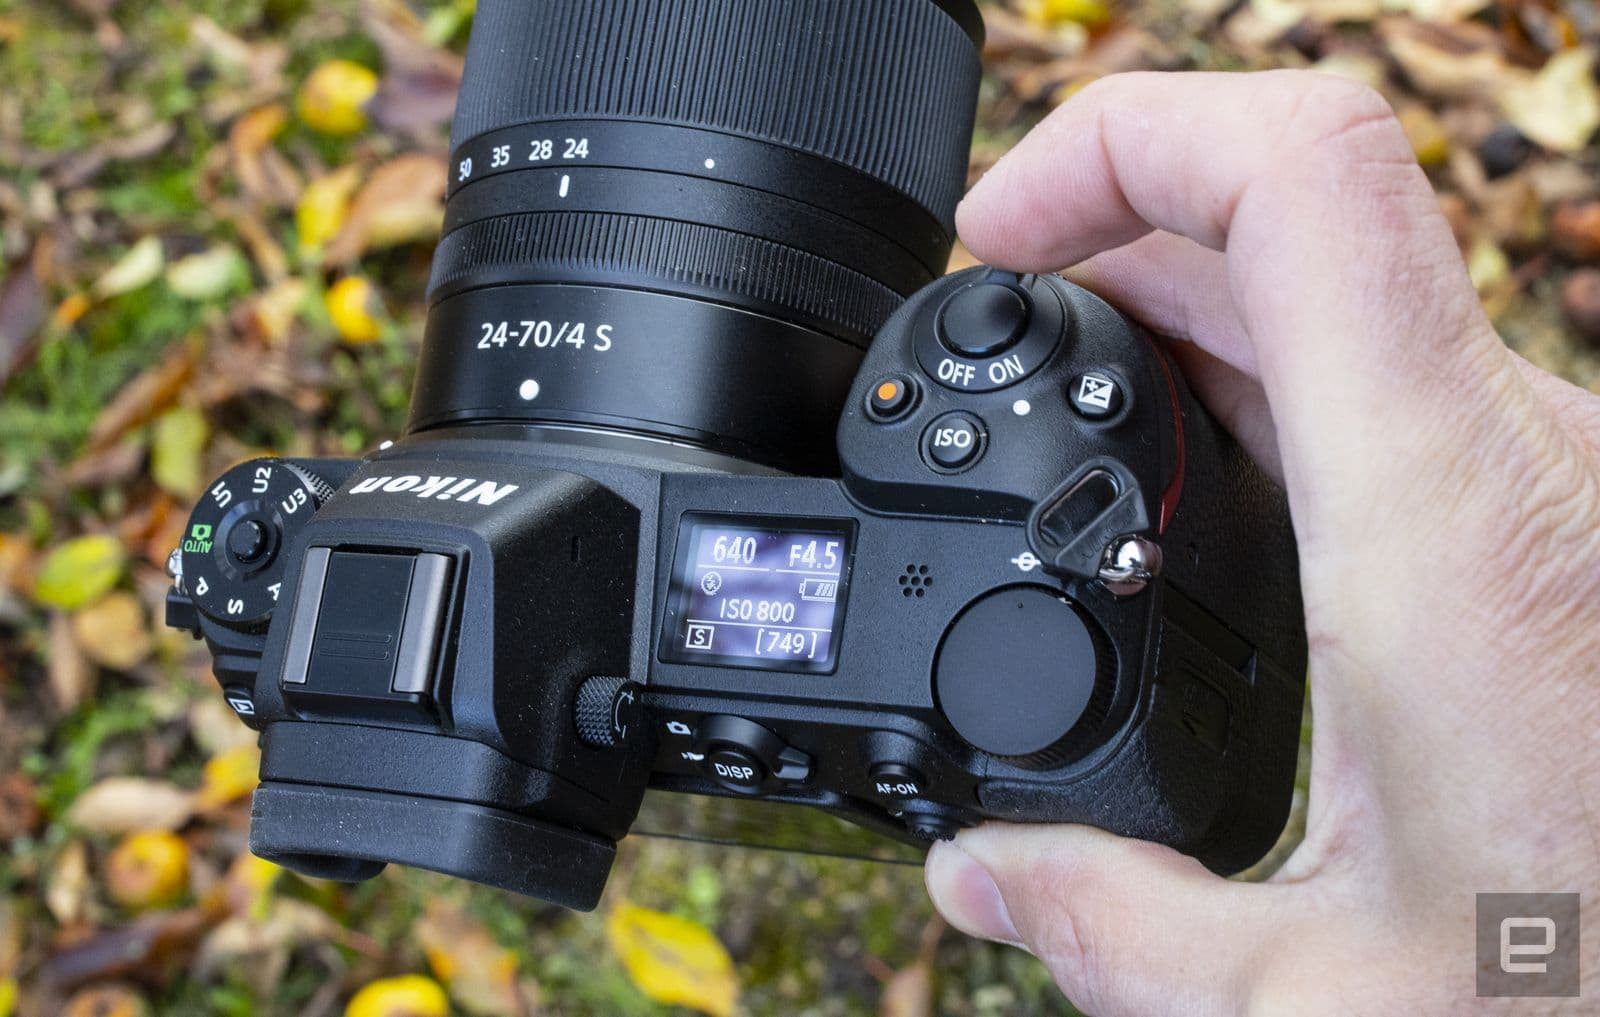 Nikon Z6 full-frame mirrorless camera review